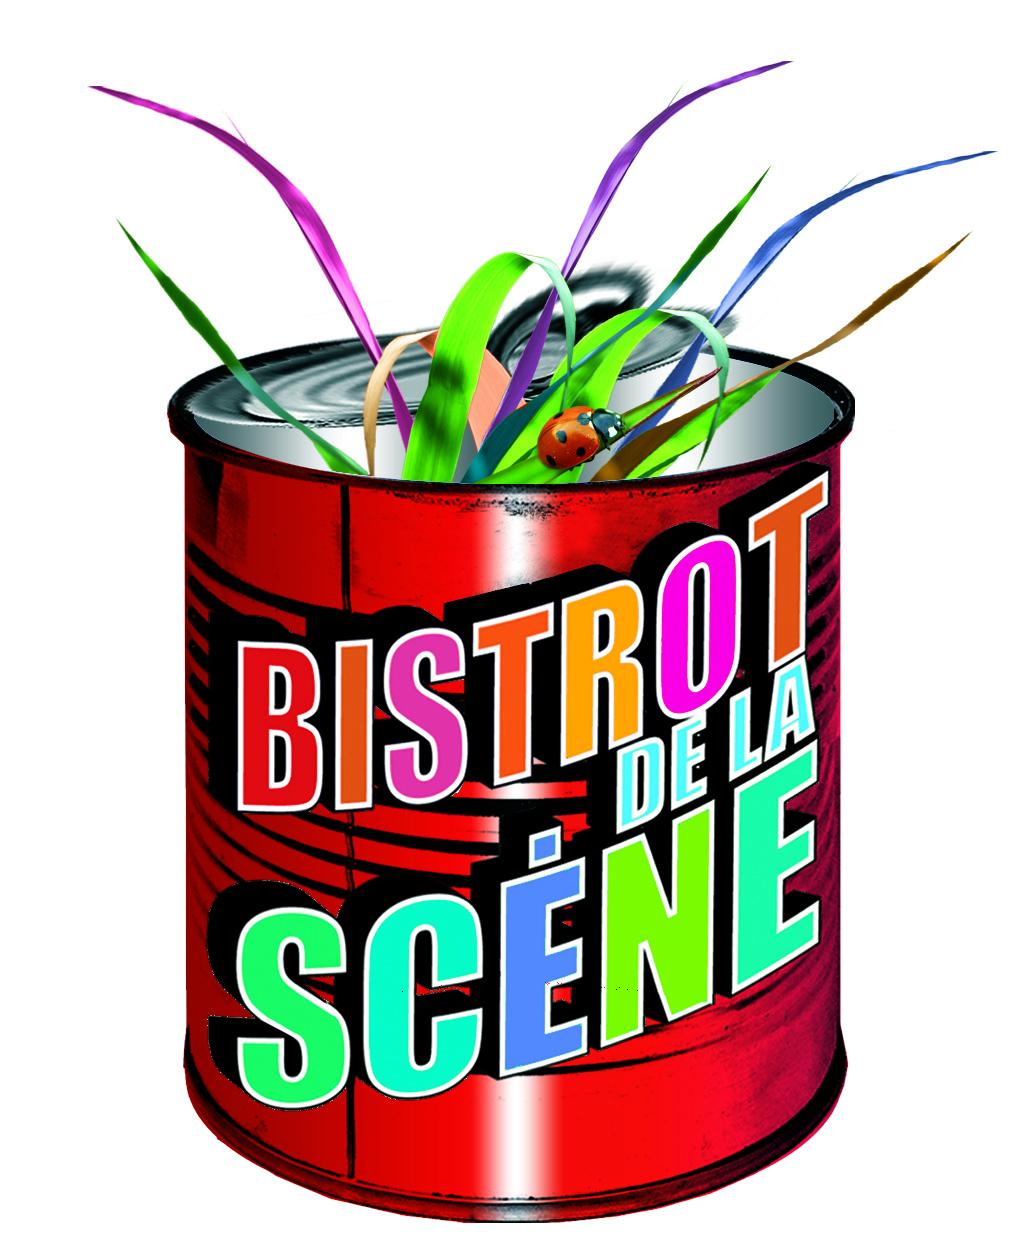 Logo Bistrot de la Scène - BISTROT DE LA SCÈNE©DR